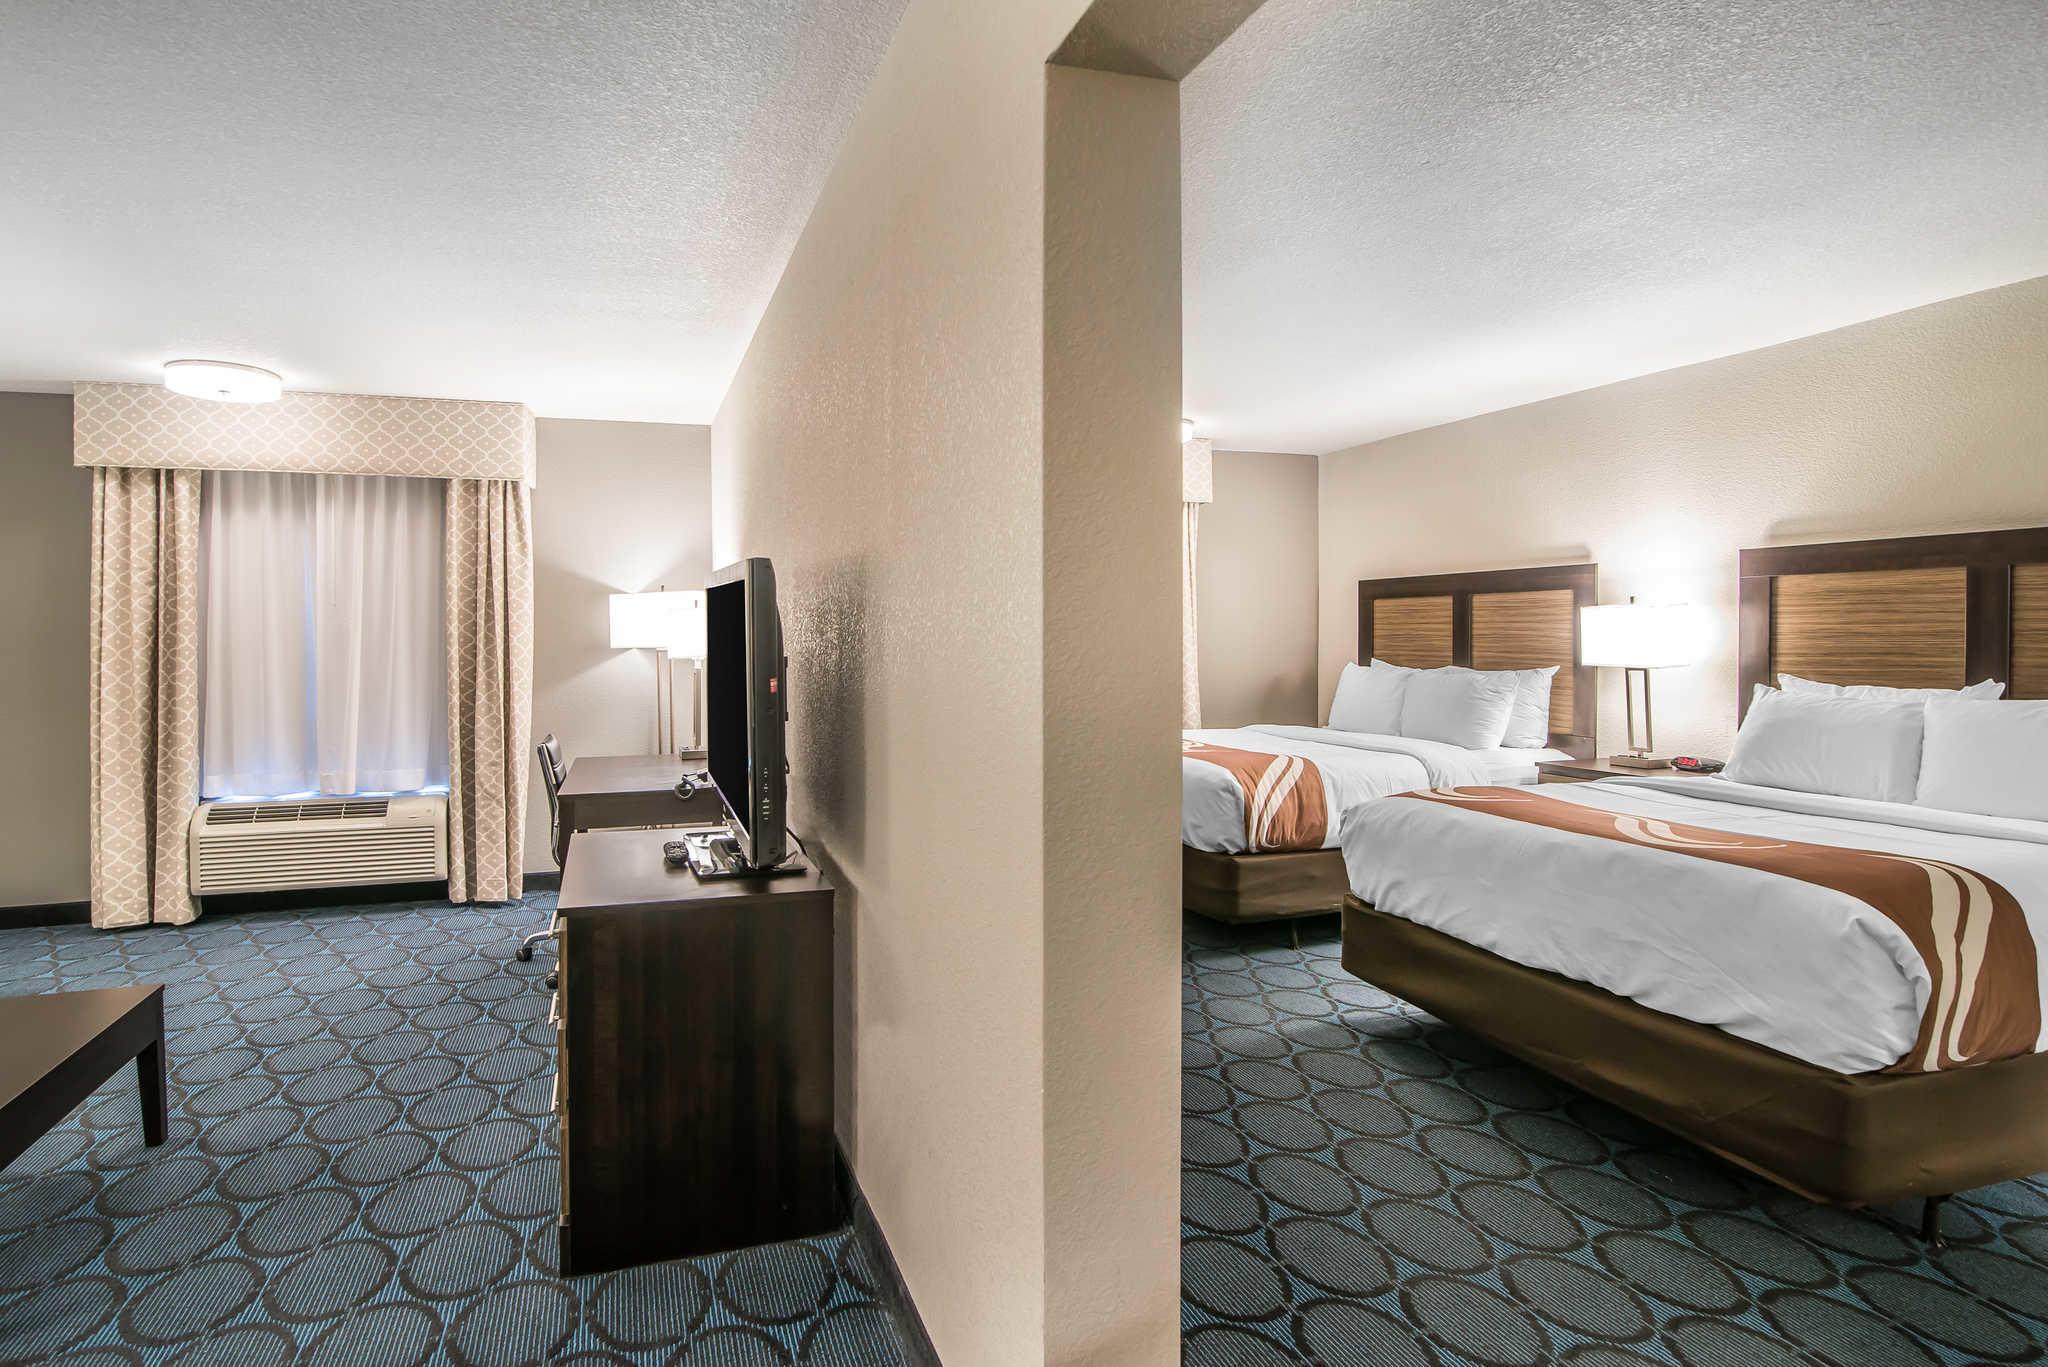 Quality Inn & Suites - Ruidoso Hwy 70 image 19